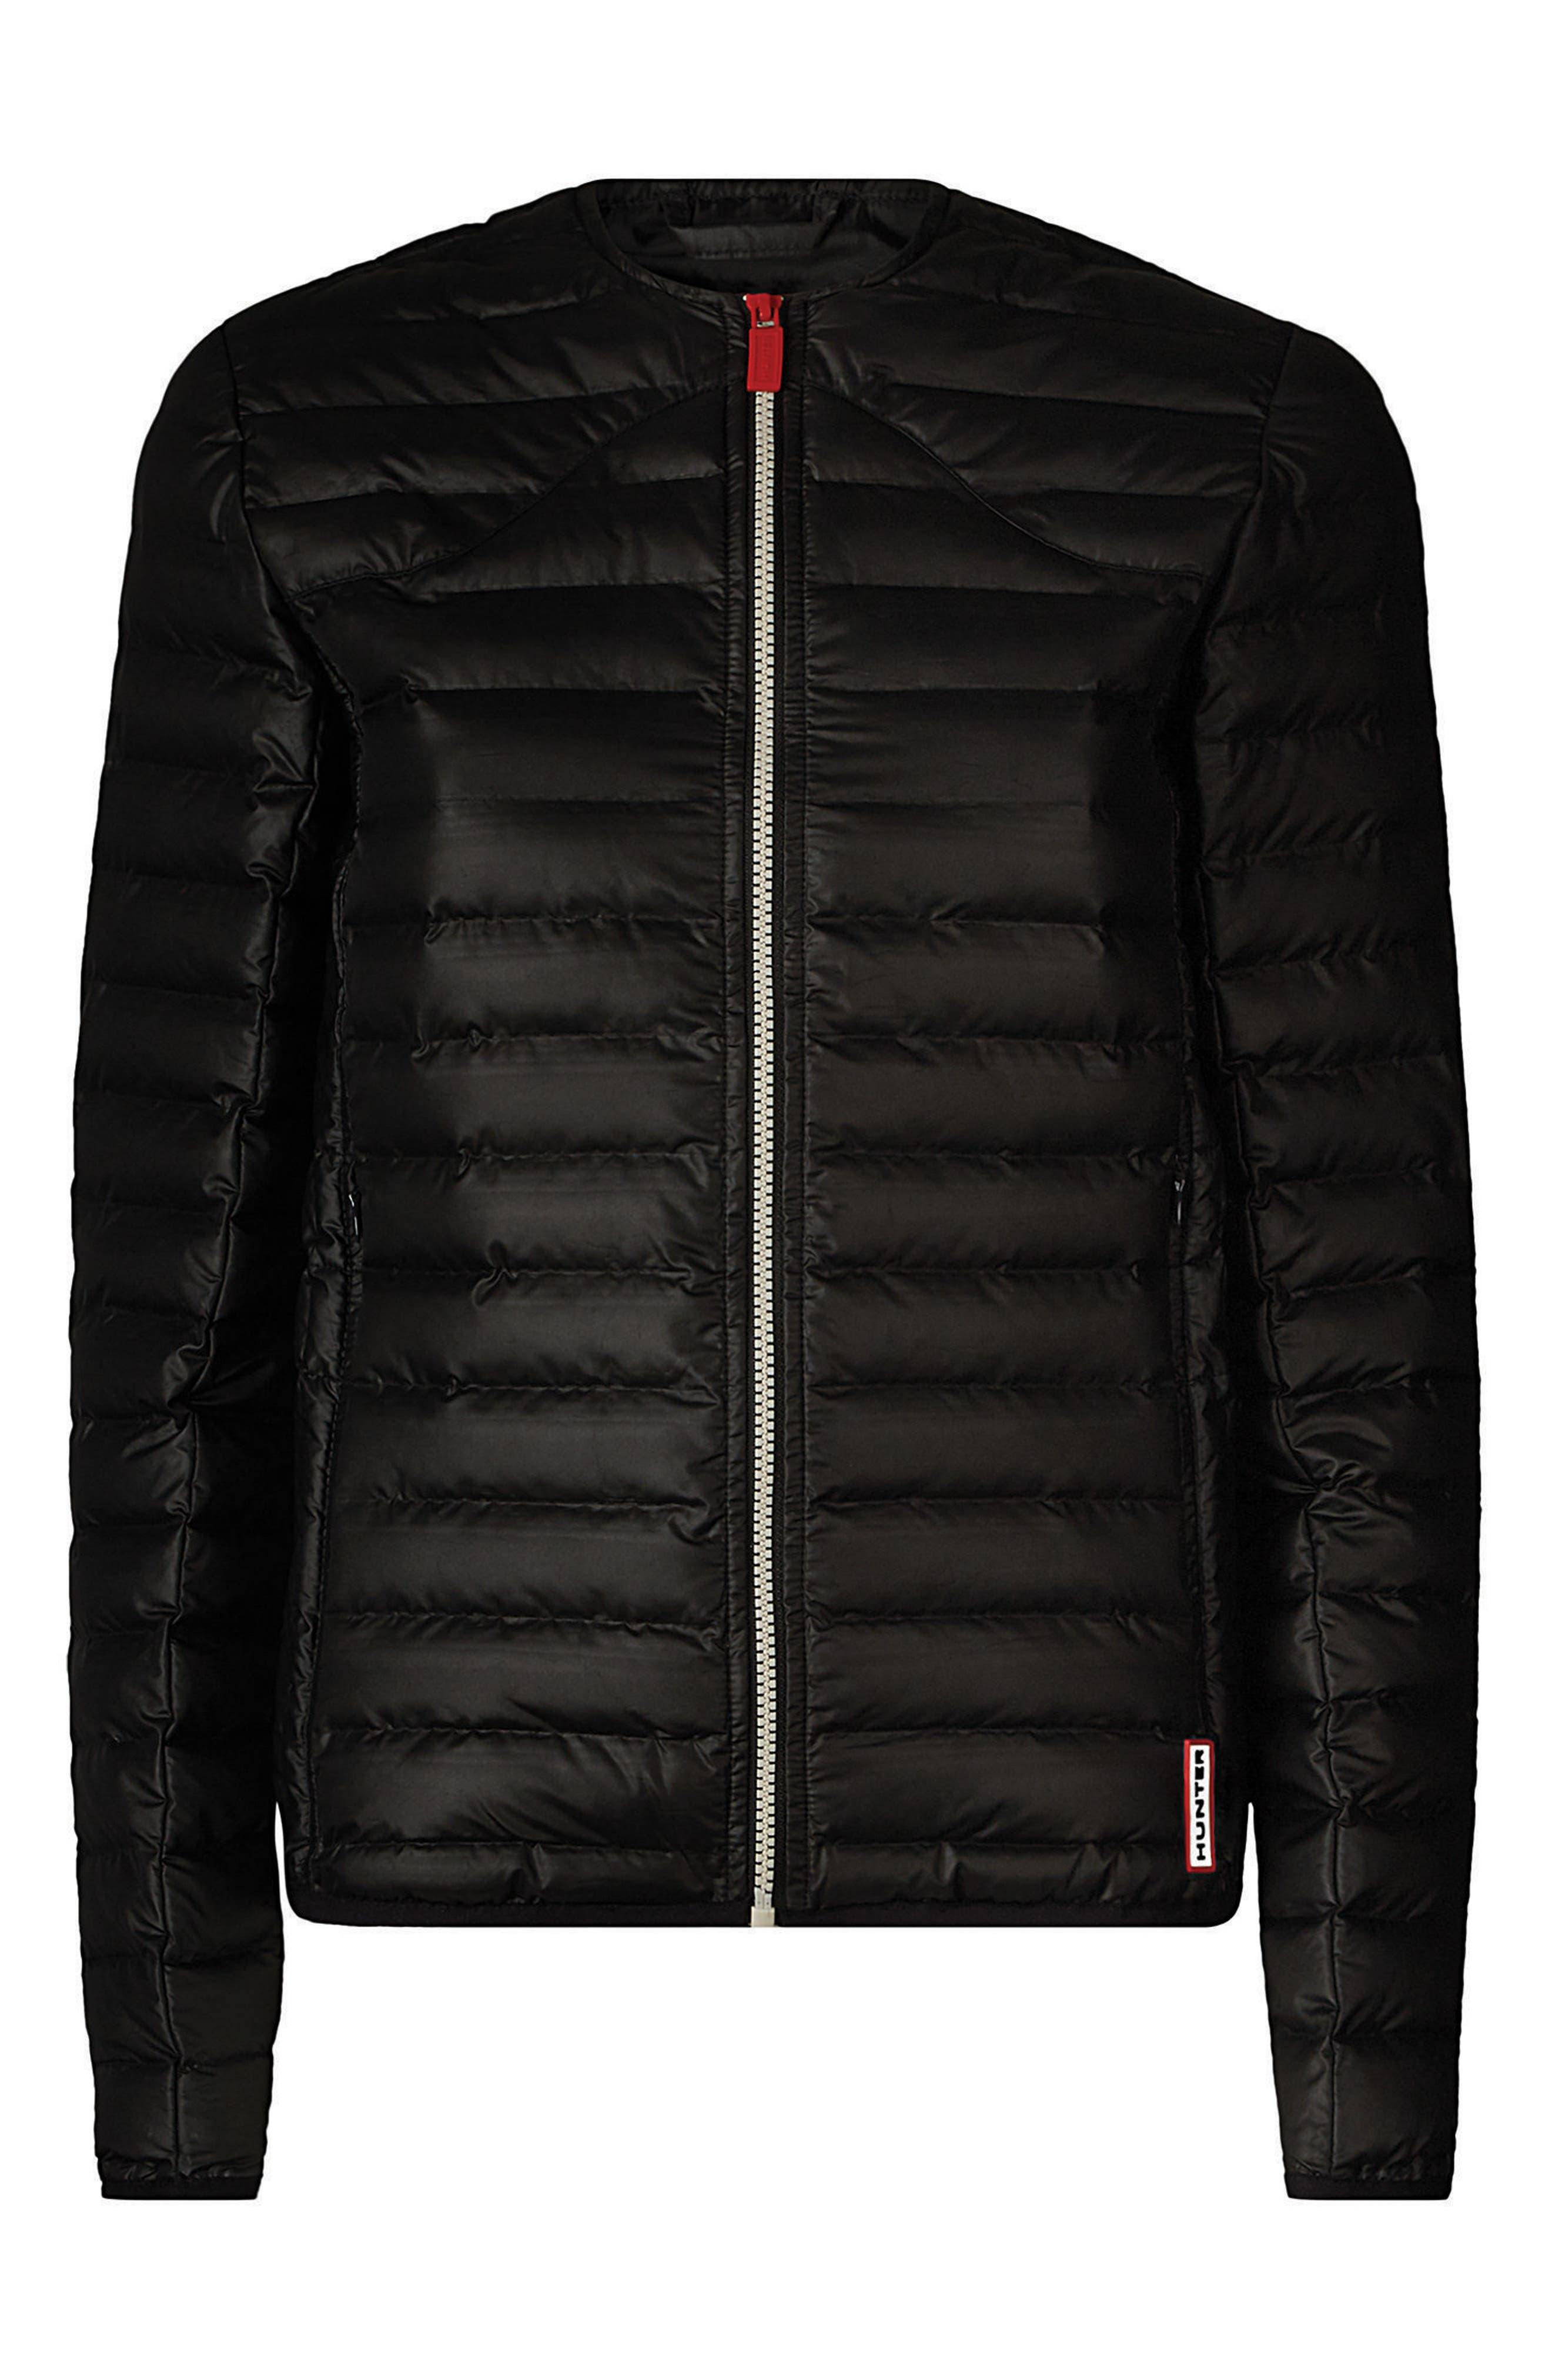 Alternate Image 3  - Hunter Original Midlayer Water Resistant Thermolite® Insulated Jacket